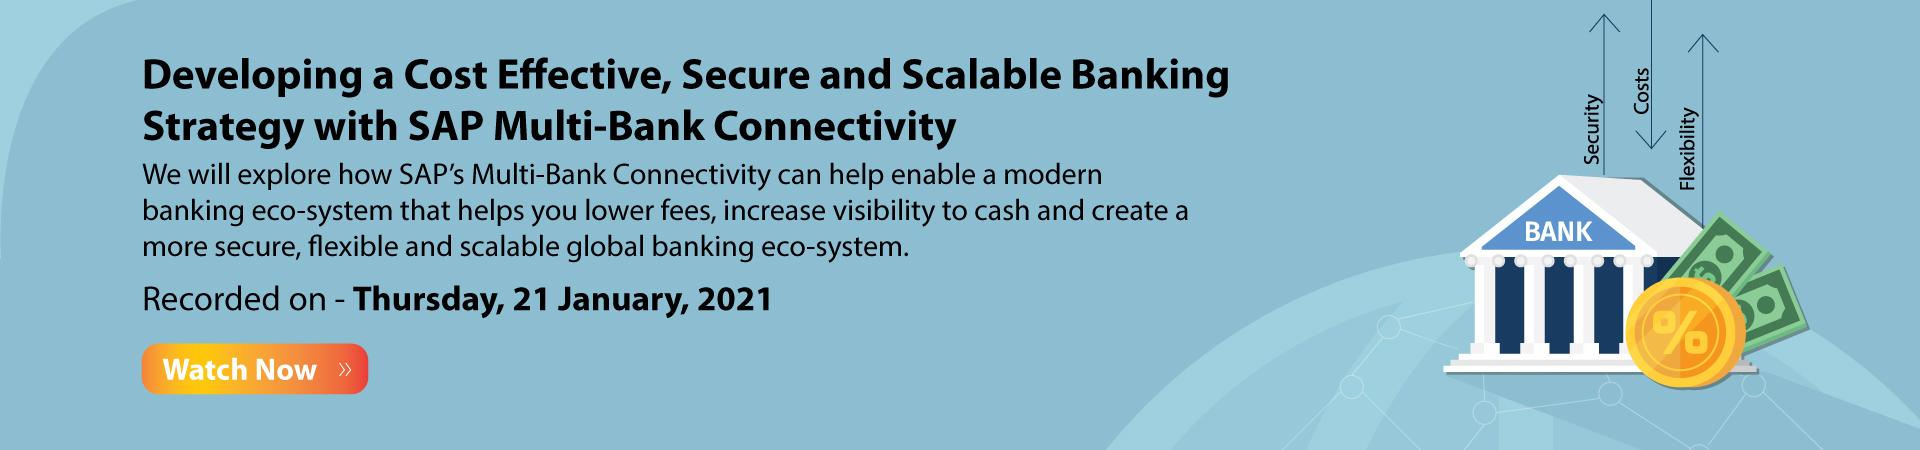 SAP Multi-Bank Connectivity Banner